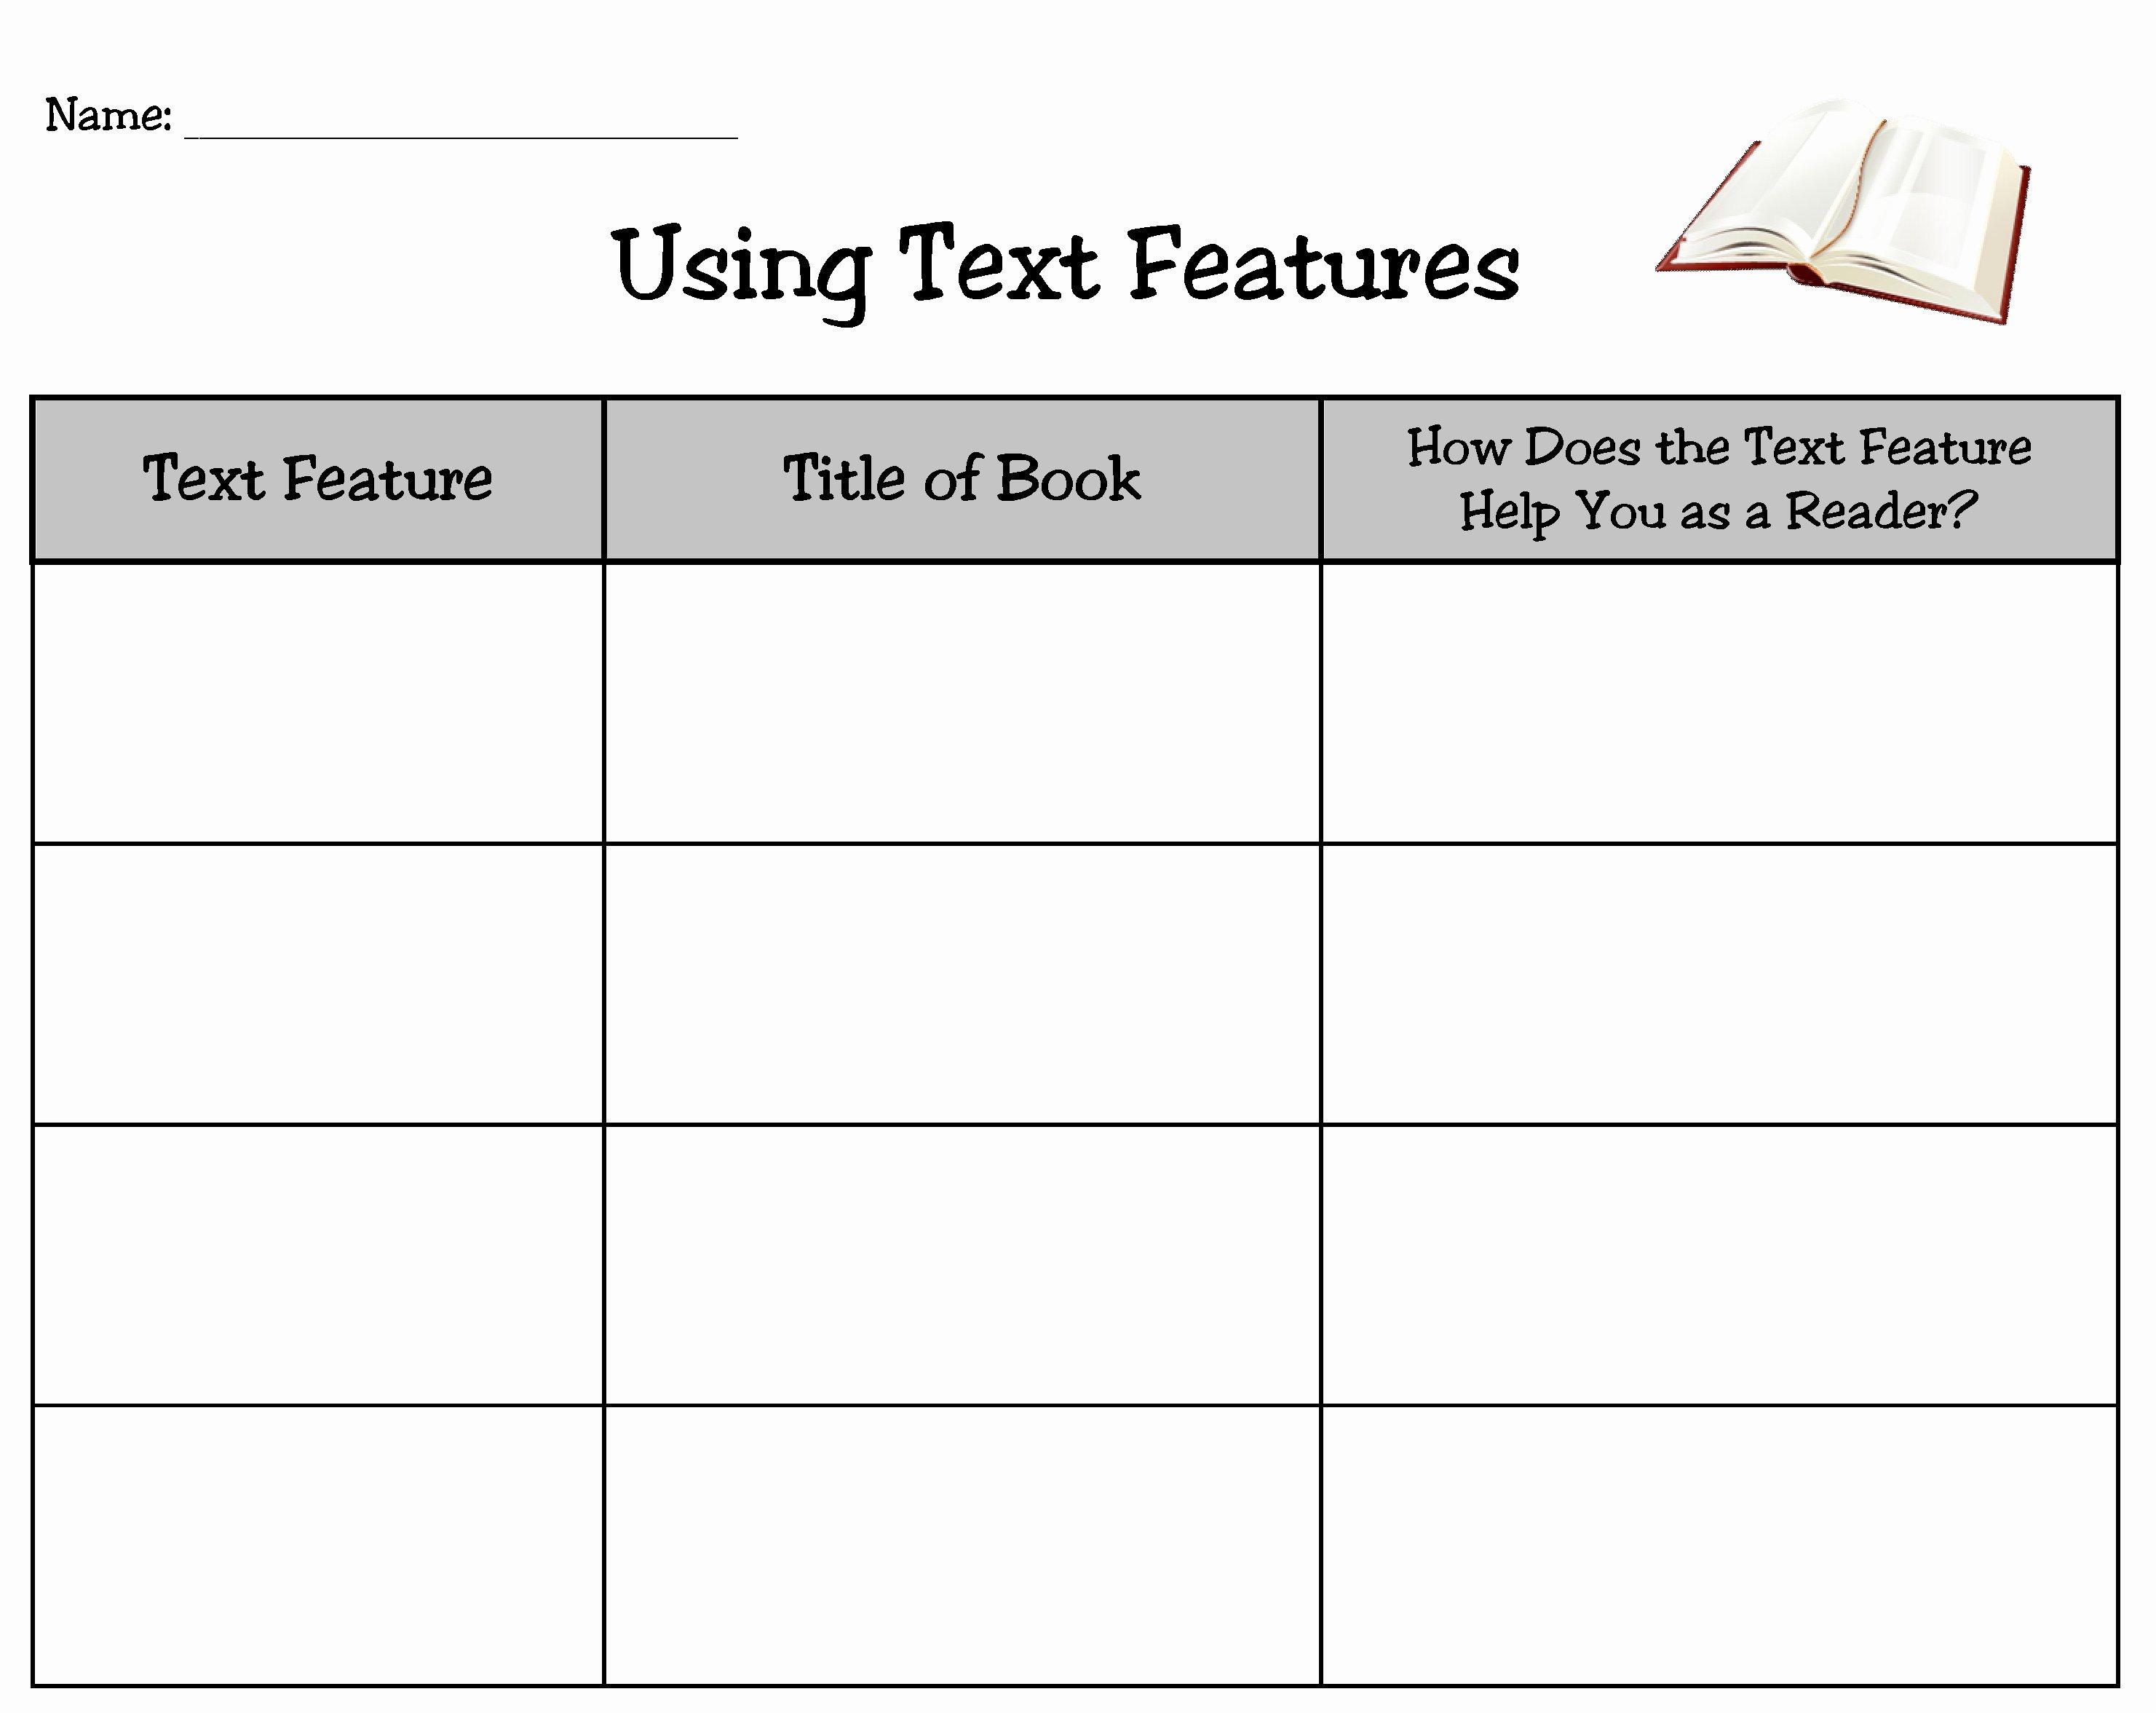 Text Features Worksheet 3rd Grade Unique Nonfiction Text Features Worksheet 3rd Grade the Best